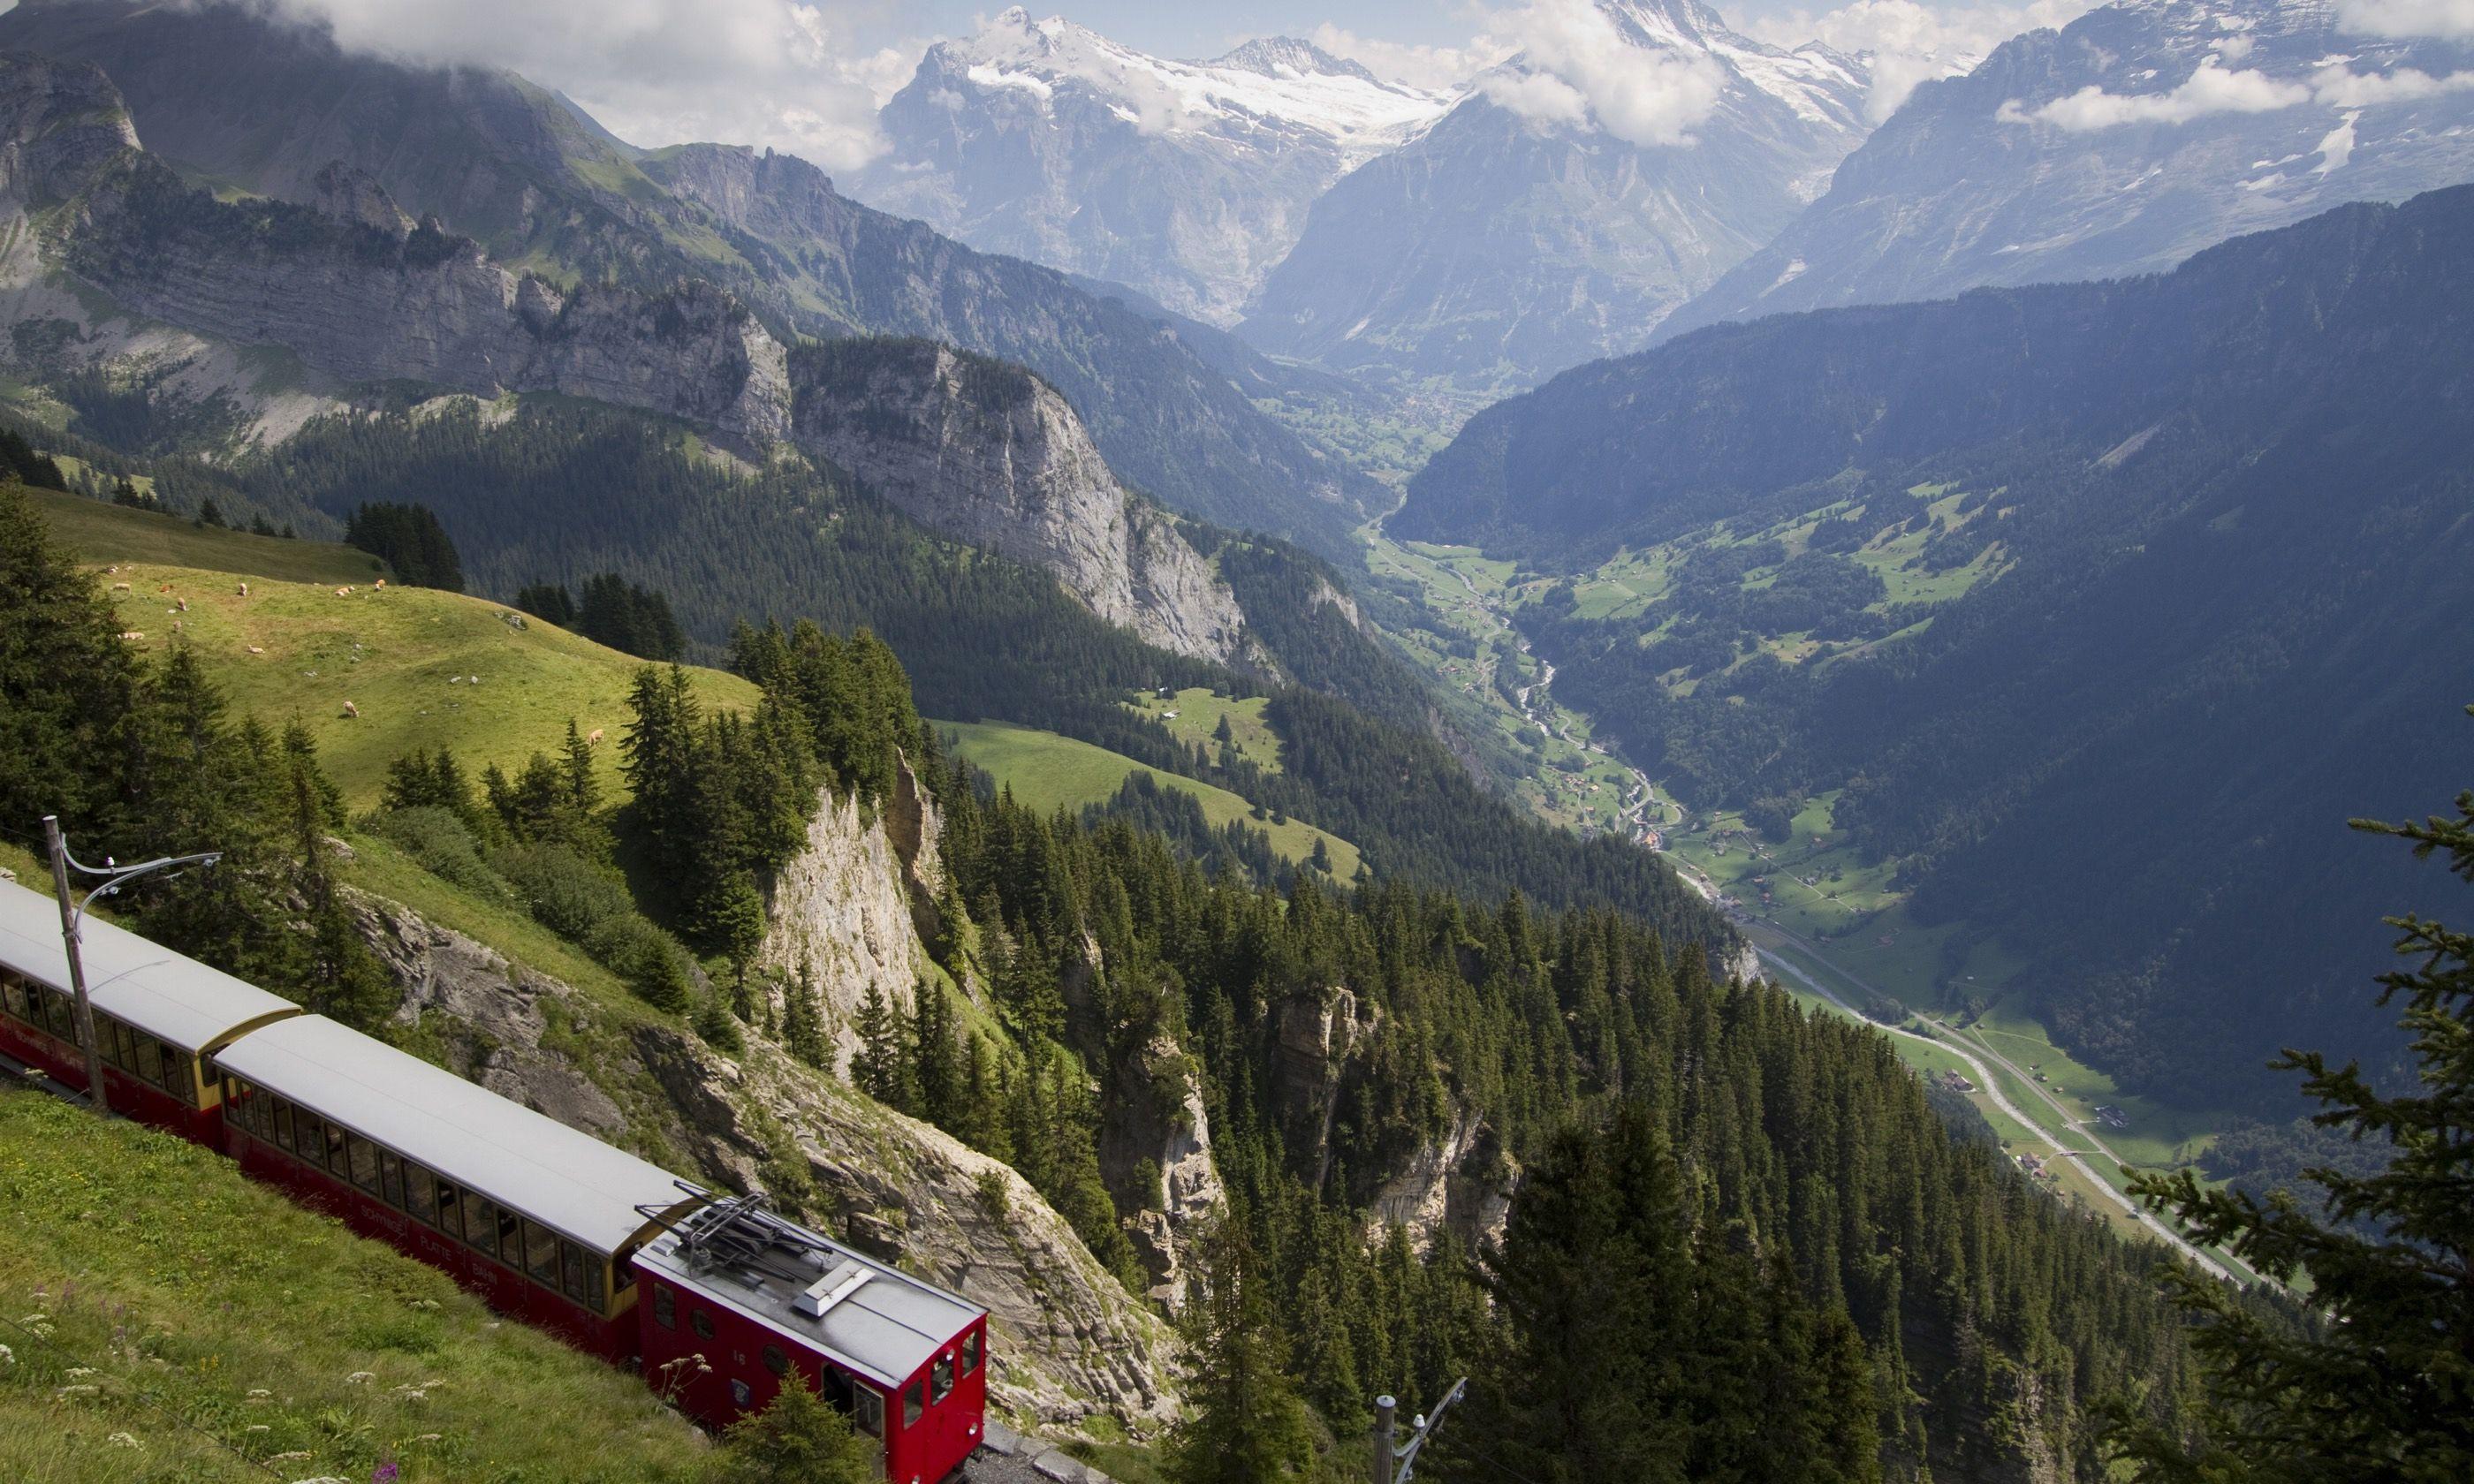 Alpen Express (Dreamstime)